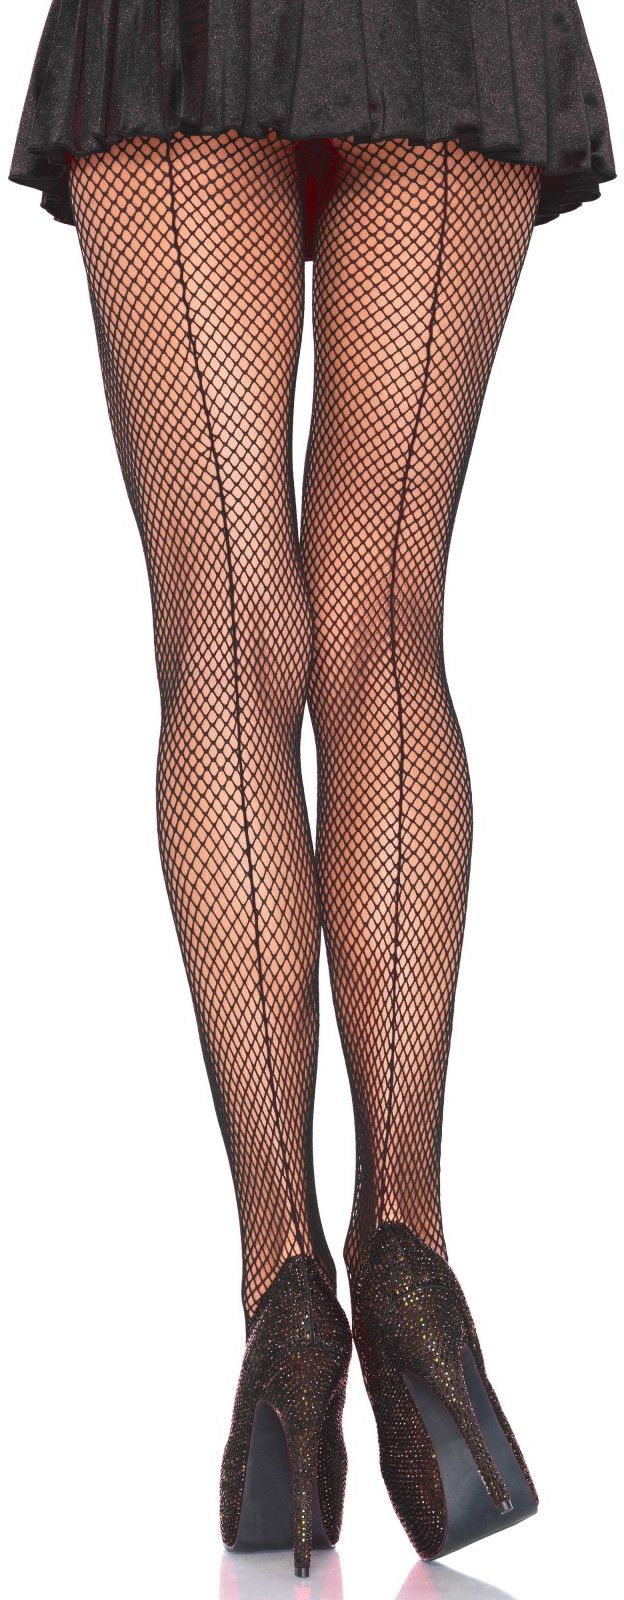 Leg Avenue Backseam Fishnet Pantyhose 9015 Black